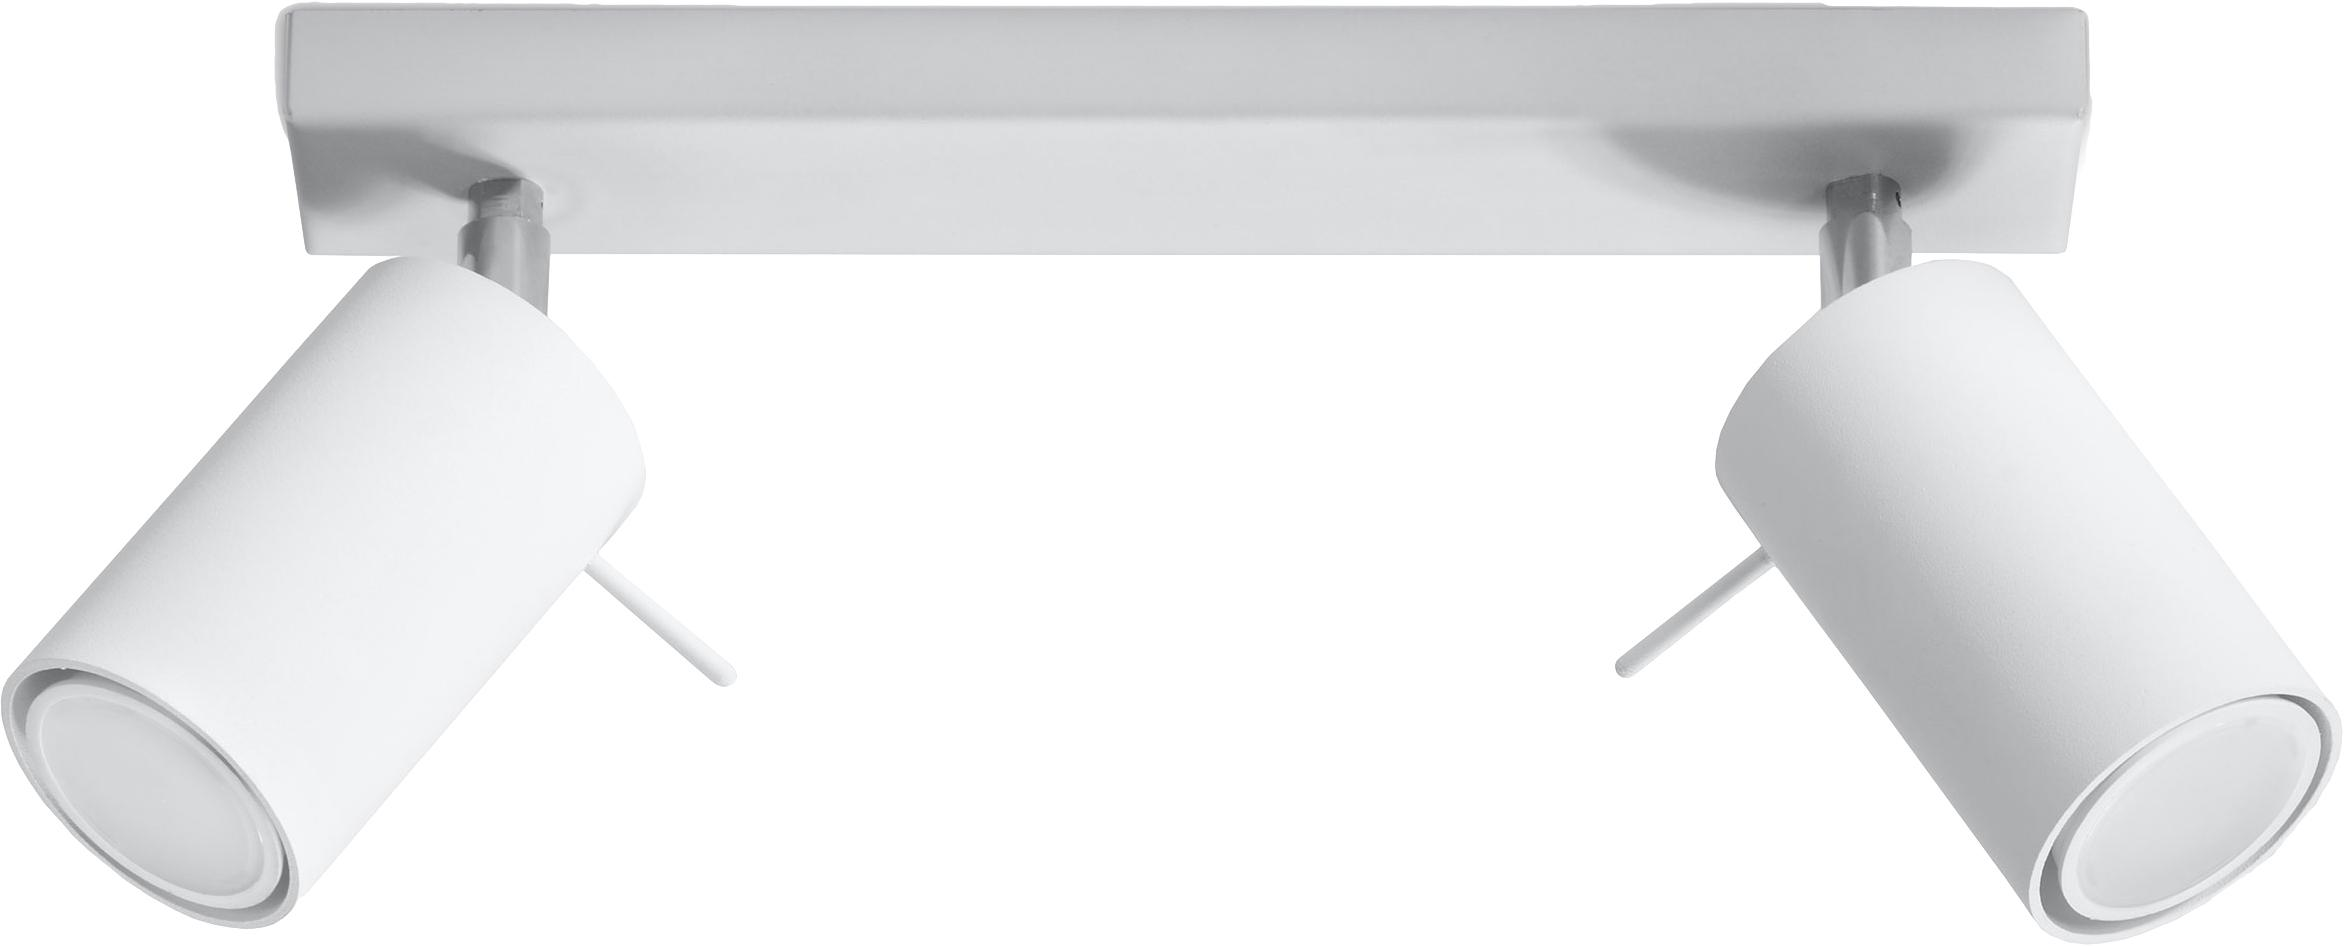 Faretti da soffitto bianchi Etna, Acciaio verniciato, Bianco, Larg. 30 x Alt. 15 cm